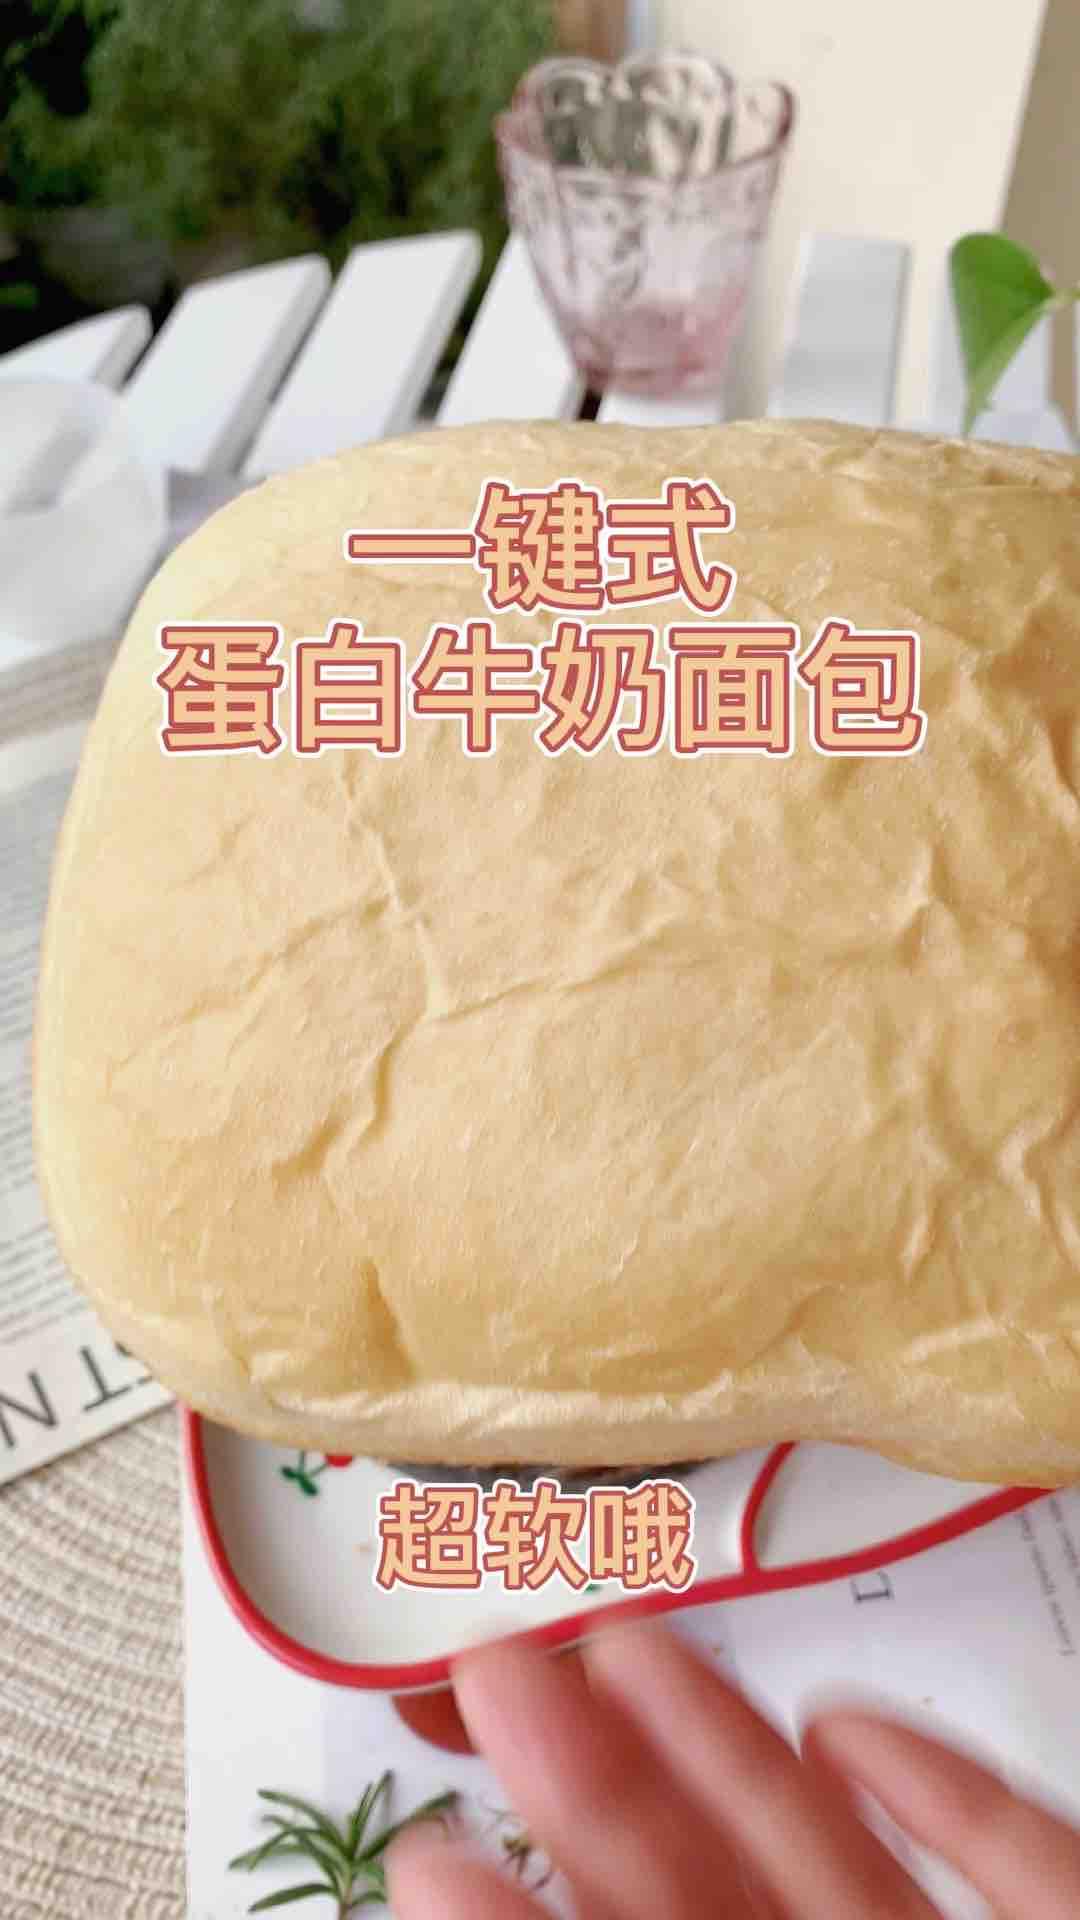 ㊙️面包机食谱❗️超柔软自制一键式吐司